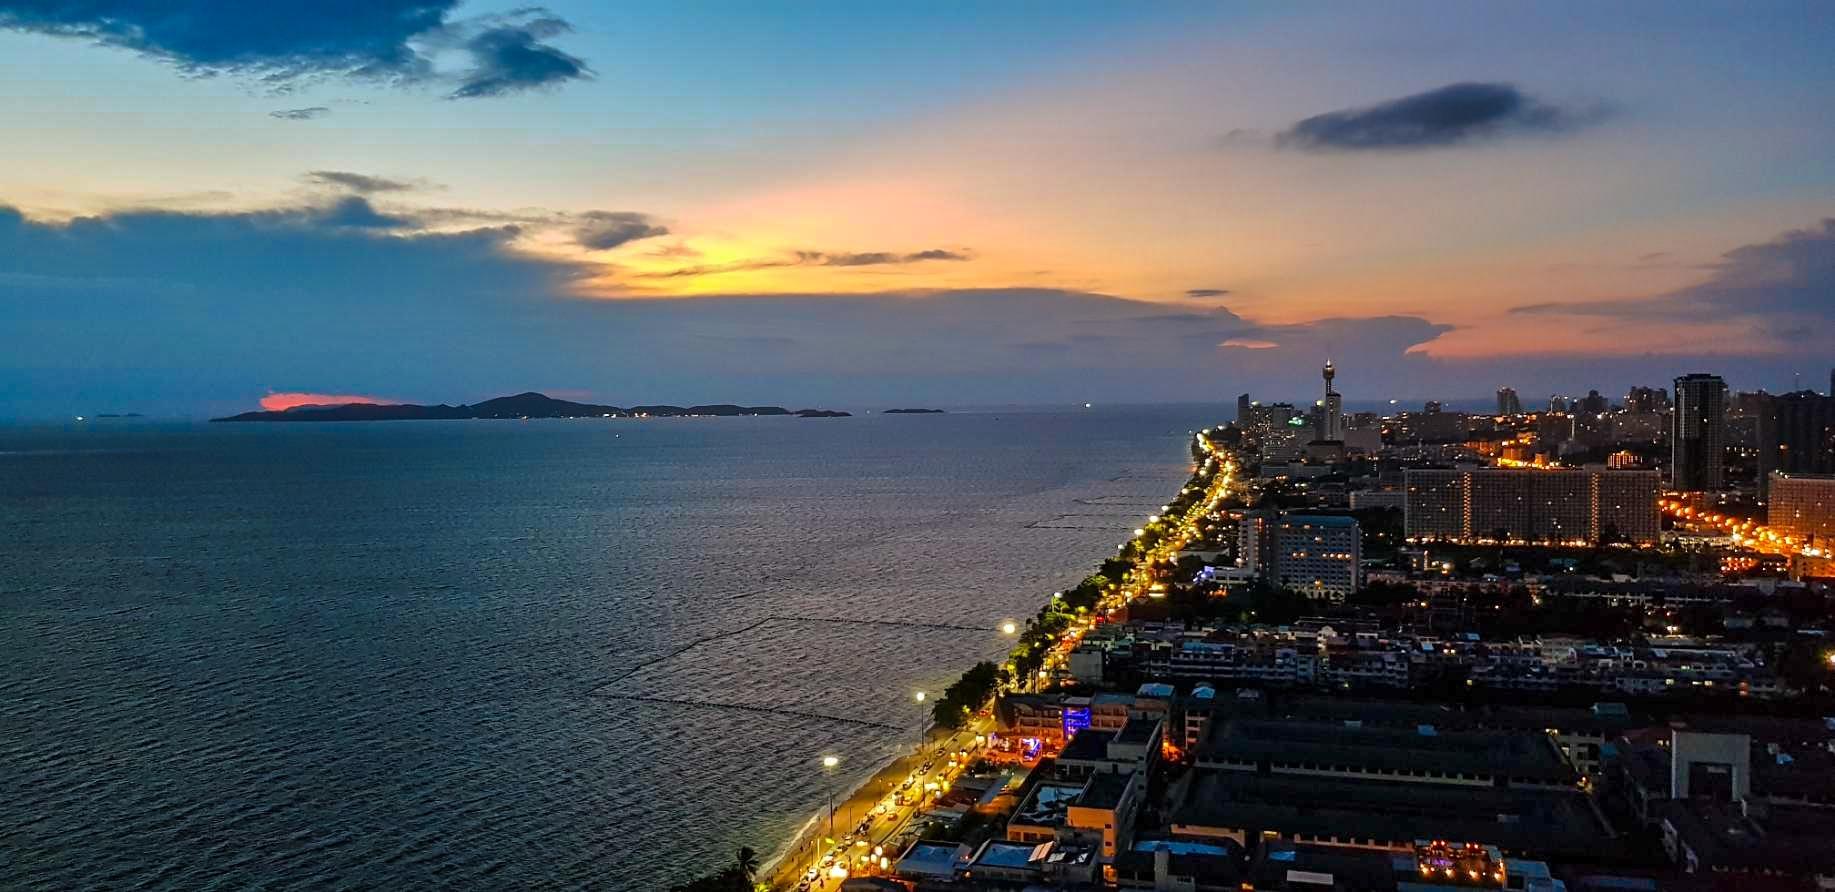 D Varee Jomtien Beach Pattaya